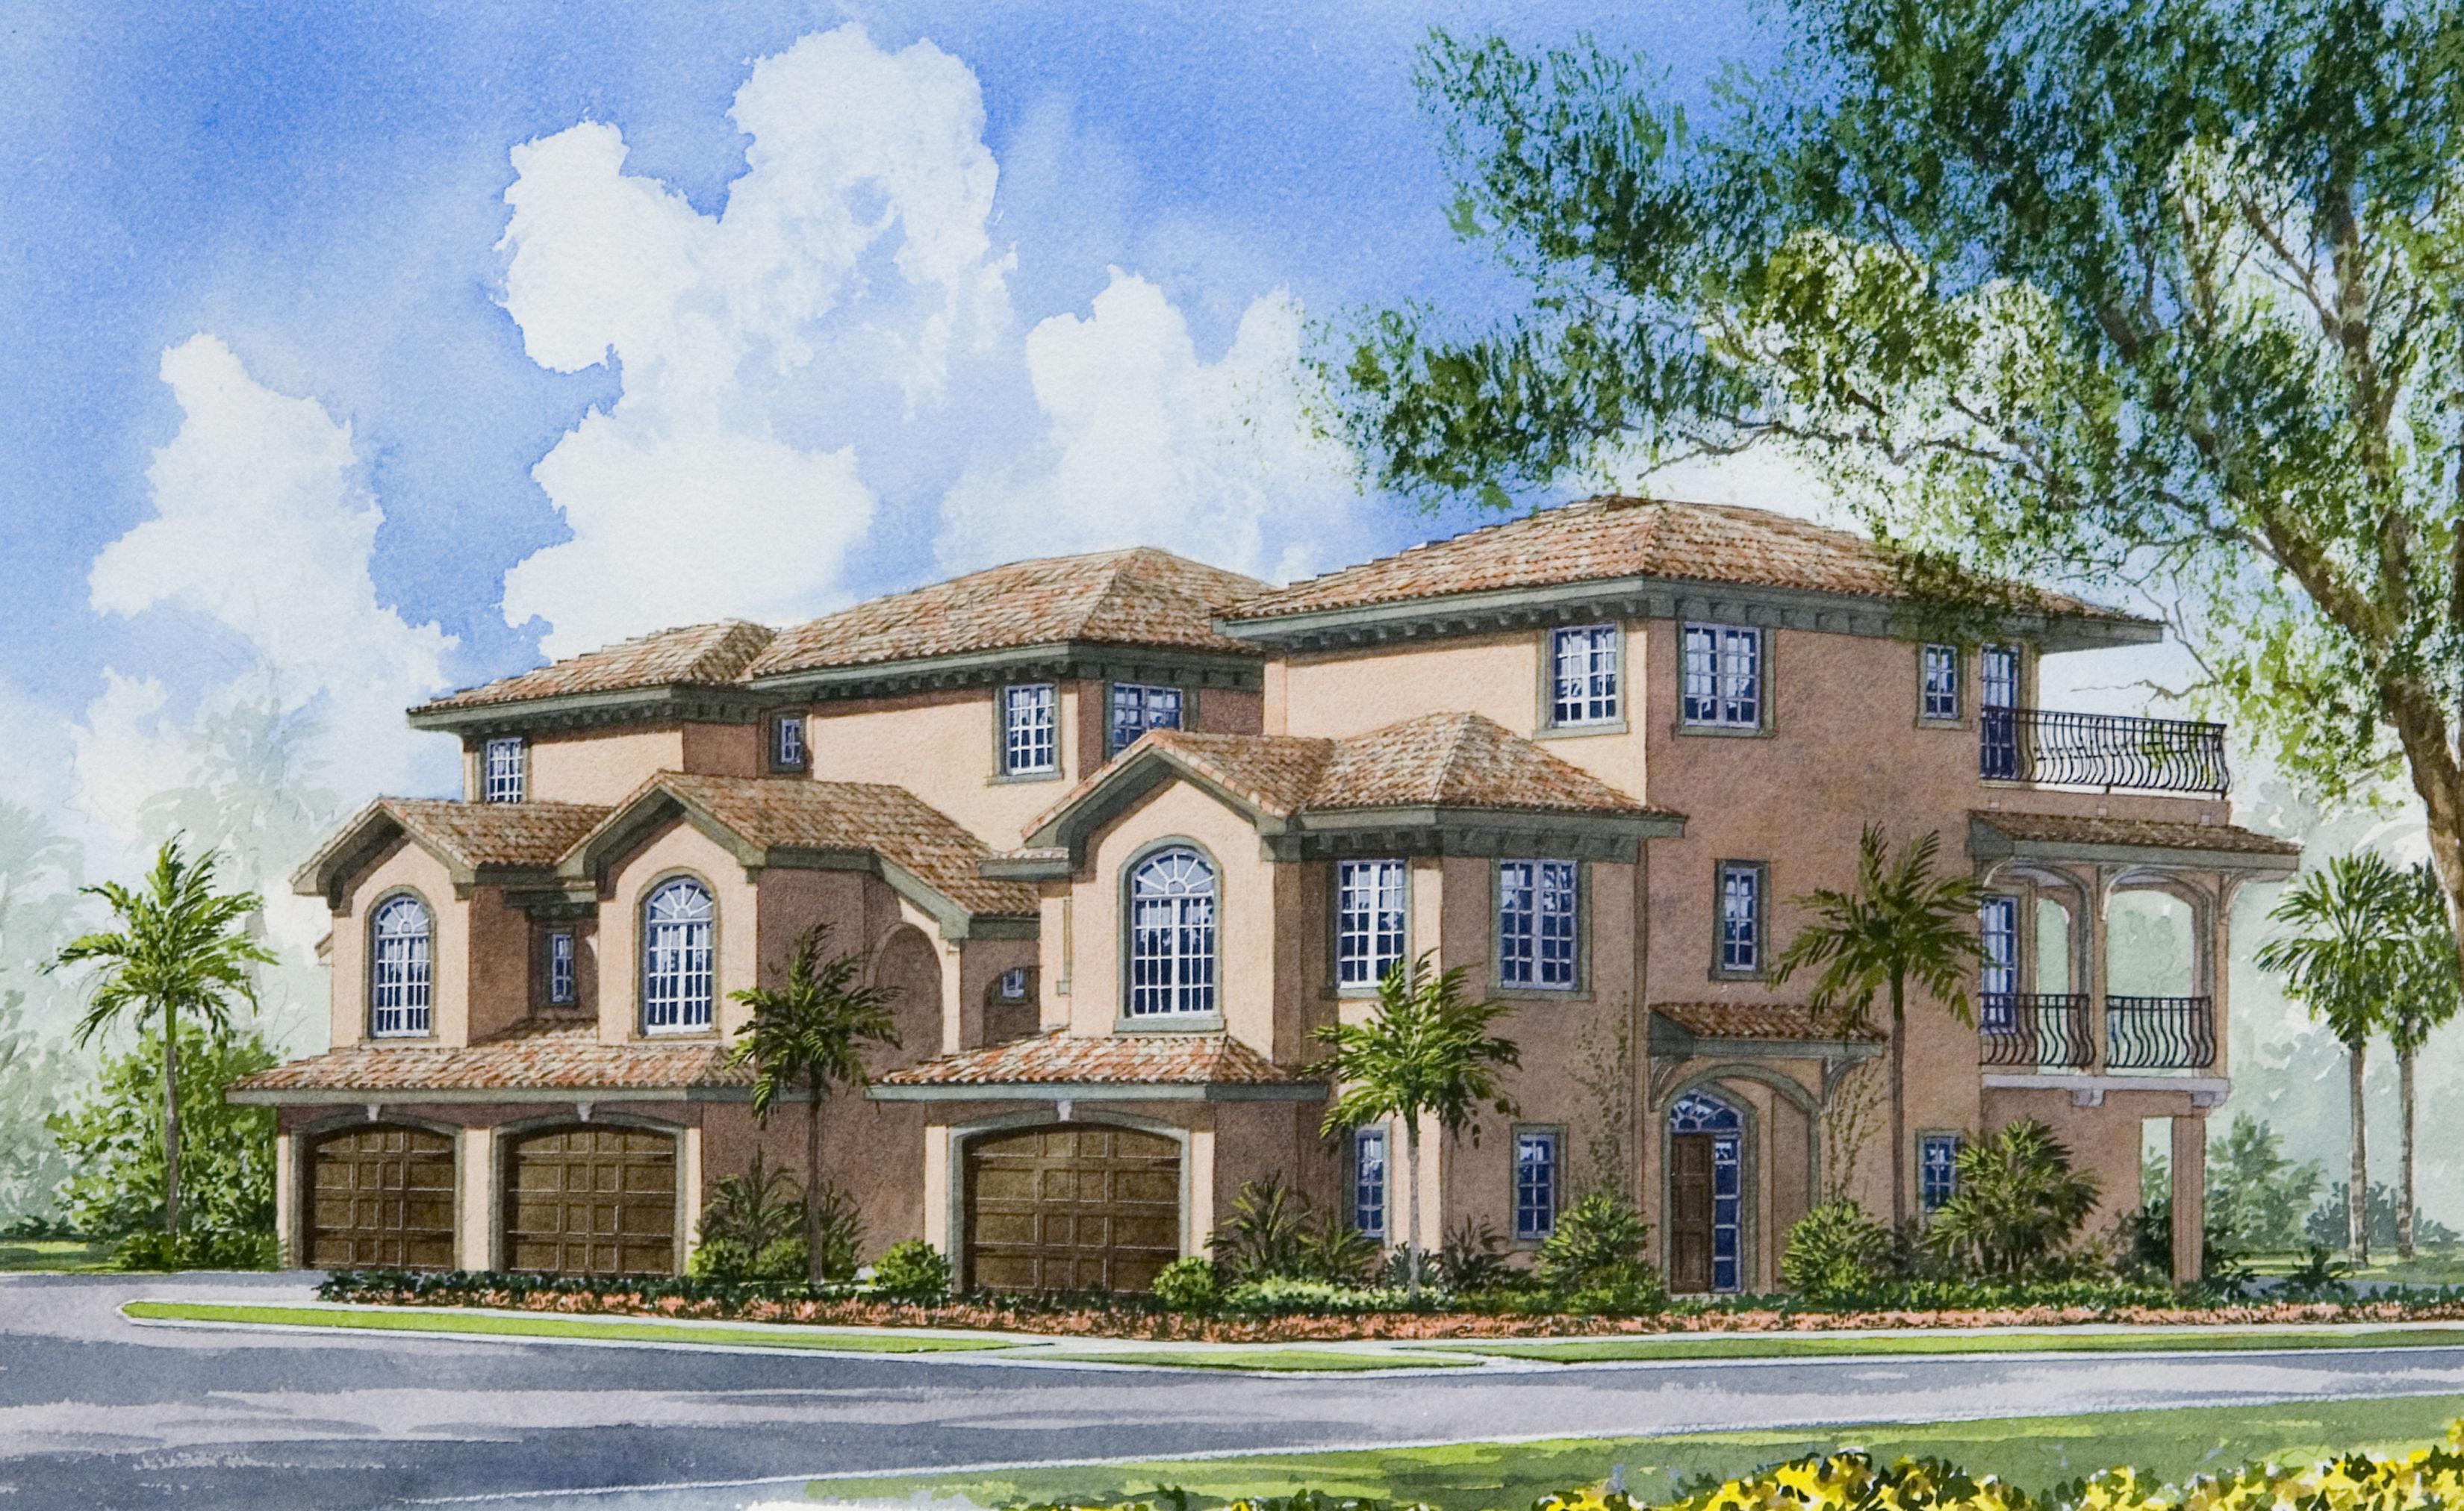 Hal Lambert Architecture and Construction, Vero Beach, Florida